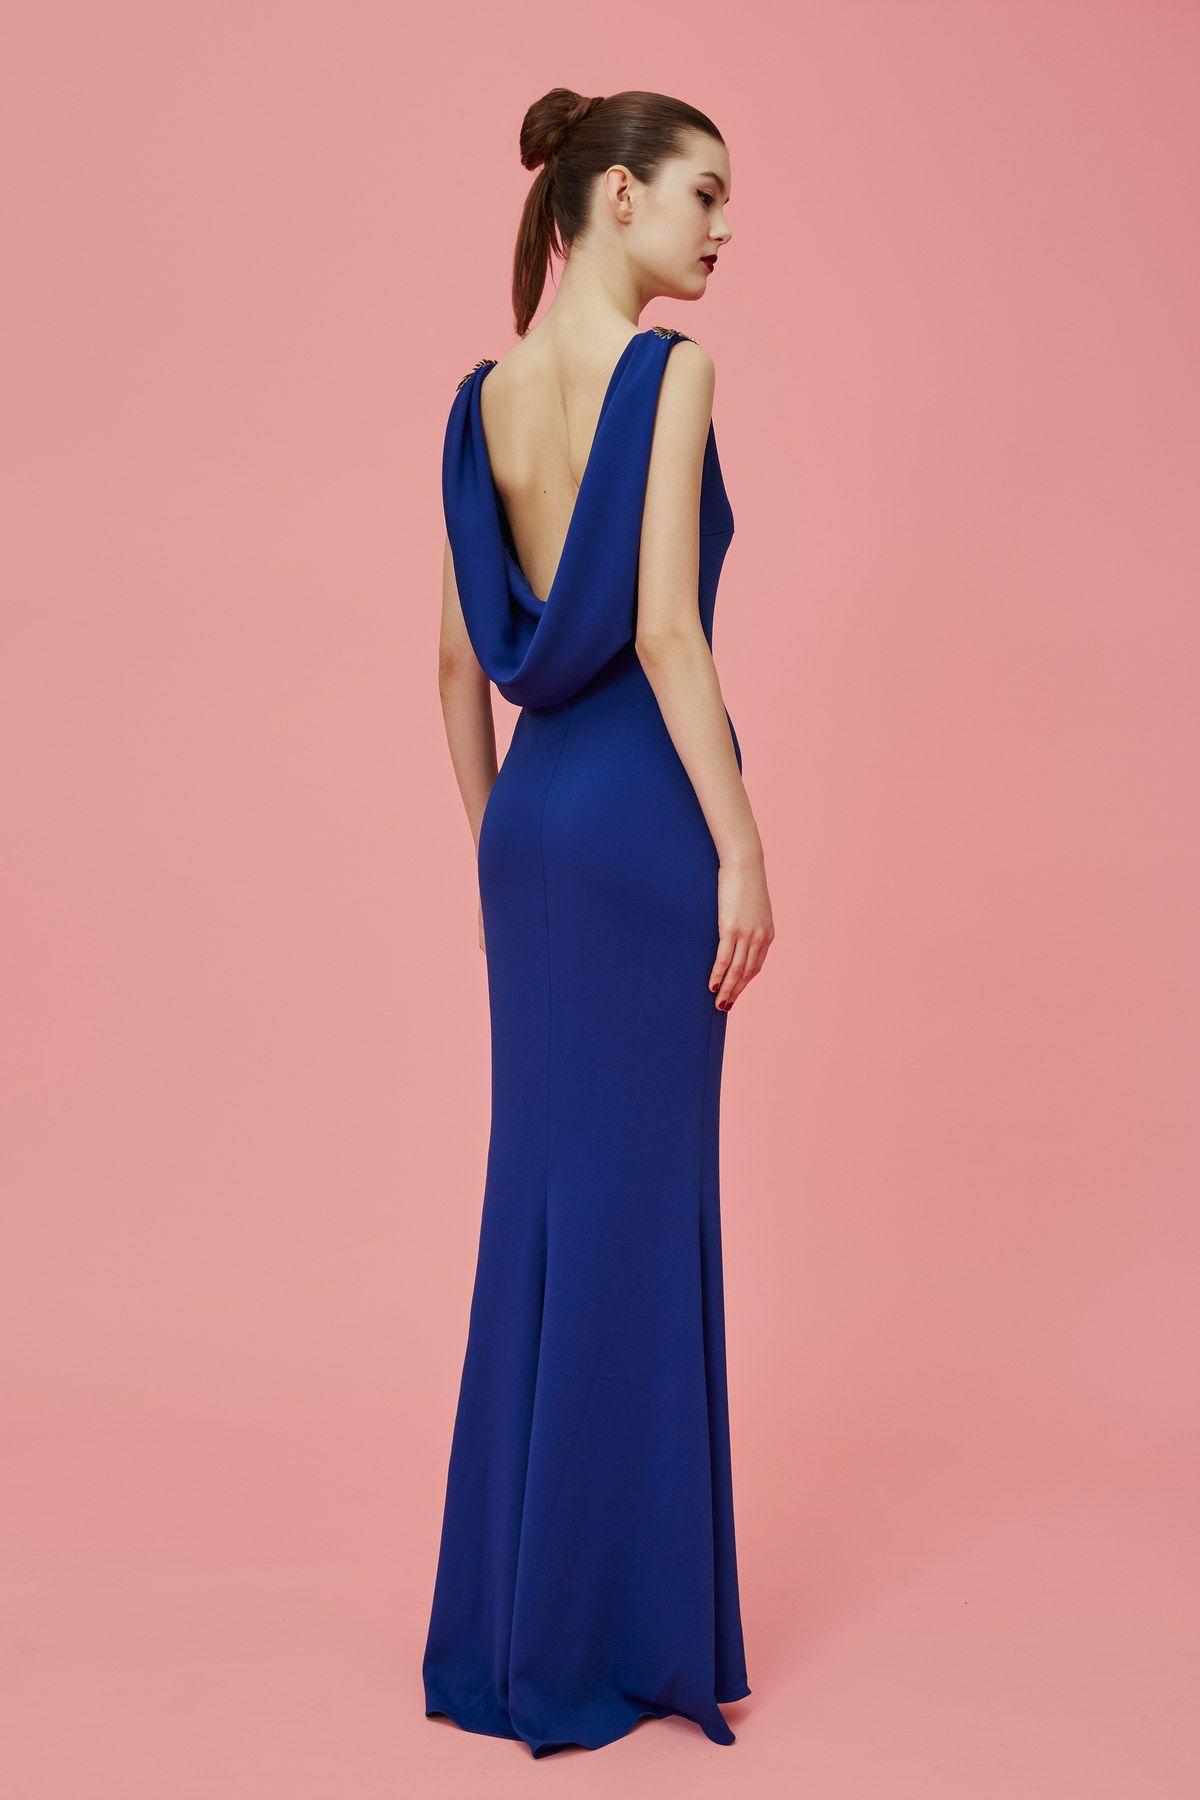 99c9de46ae Marchesa Notte Pre-Fall 2016 Fashion Show in 2019 | Wedding | Fall ...